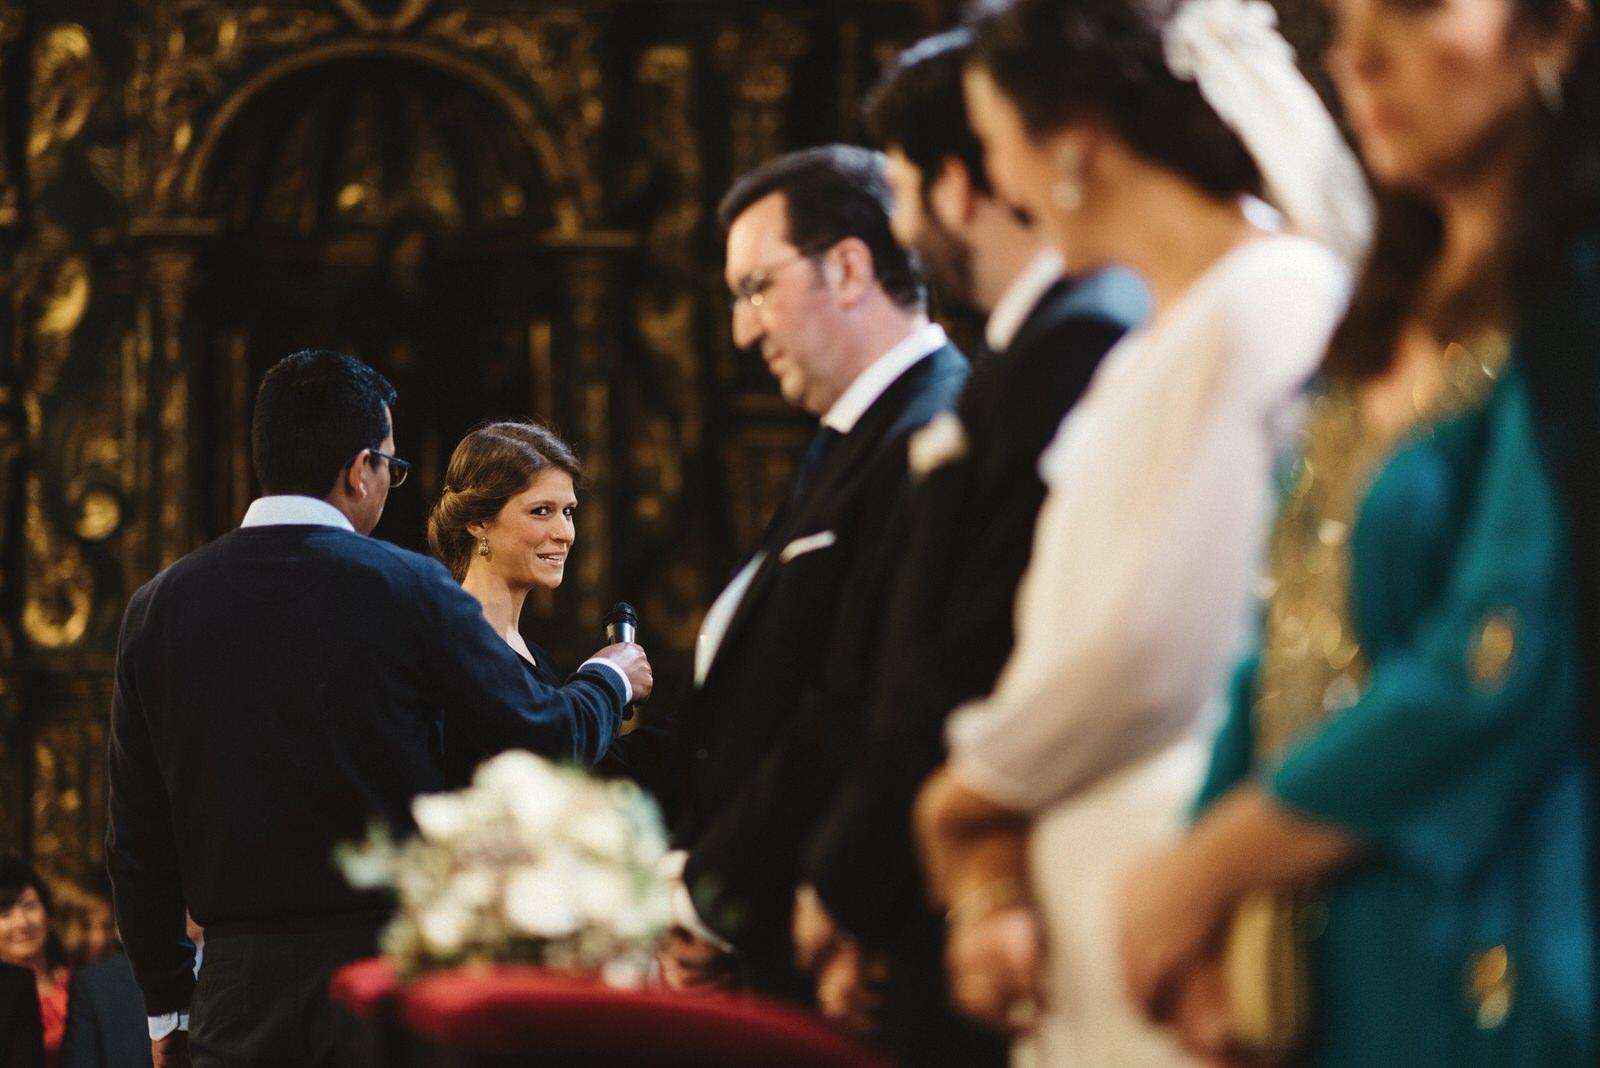 fotografo de bodas sevilla - fotografo boda - fotografía sevilla - Andrés AmarilloAAA_5071- tele- fine.JPG